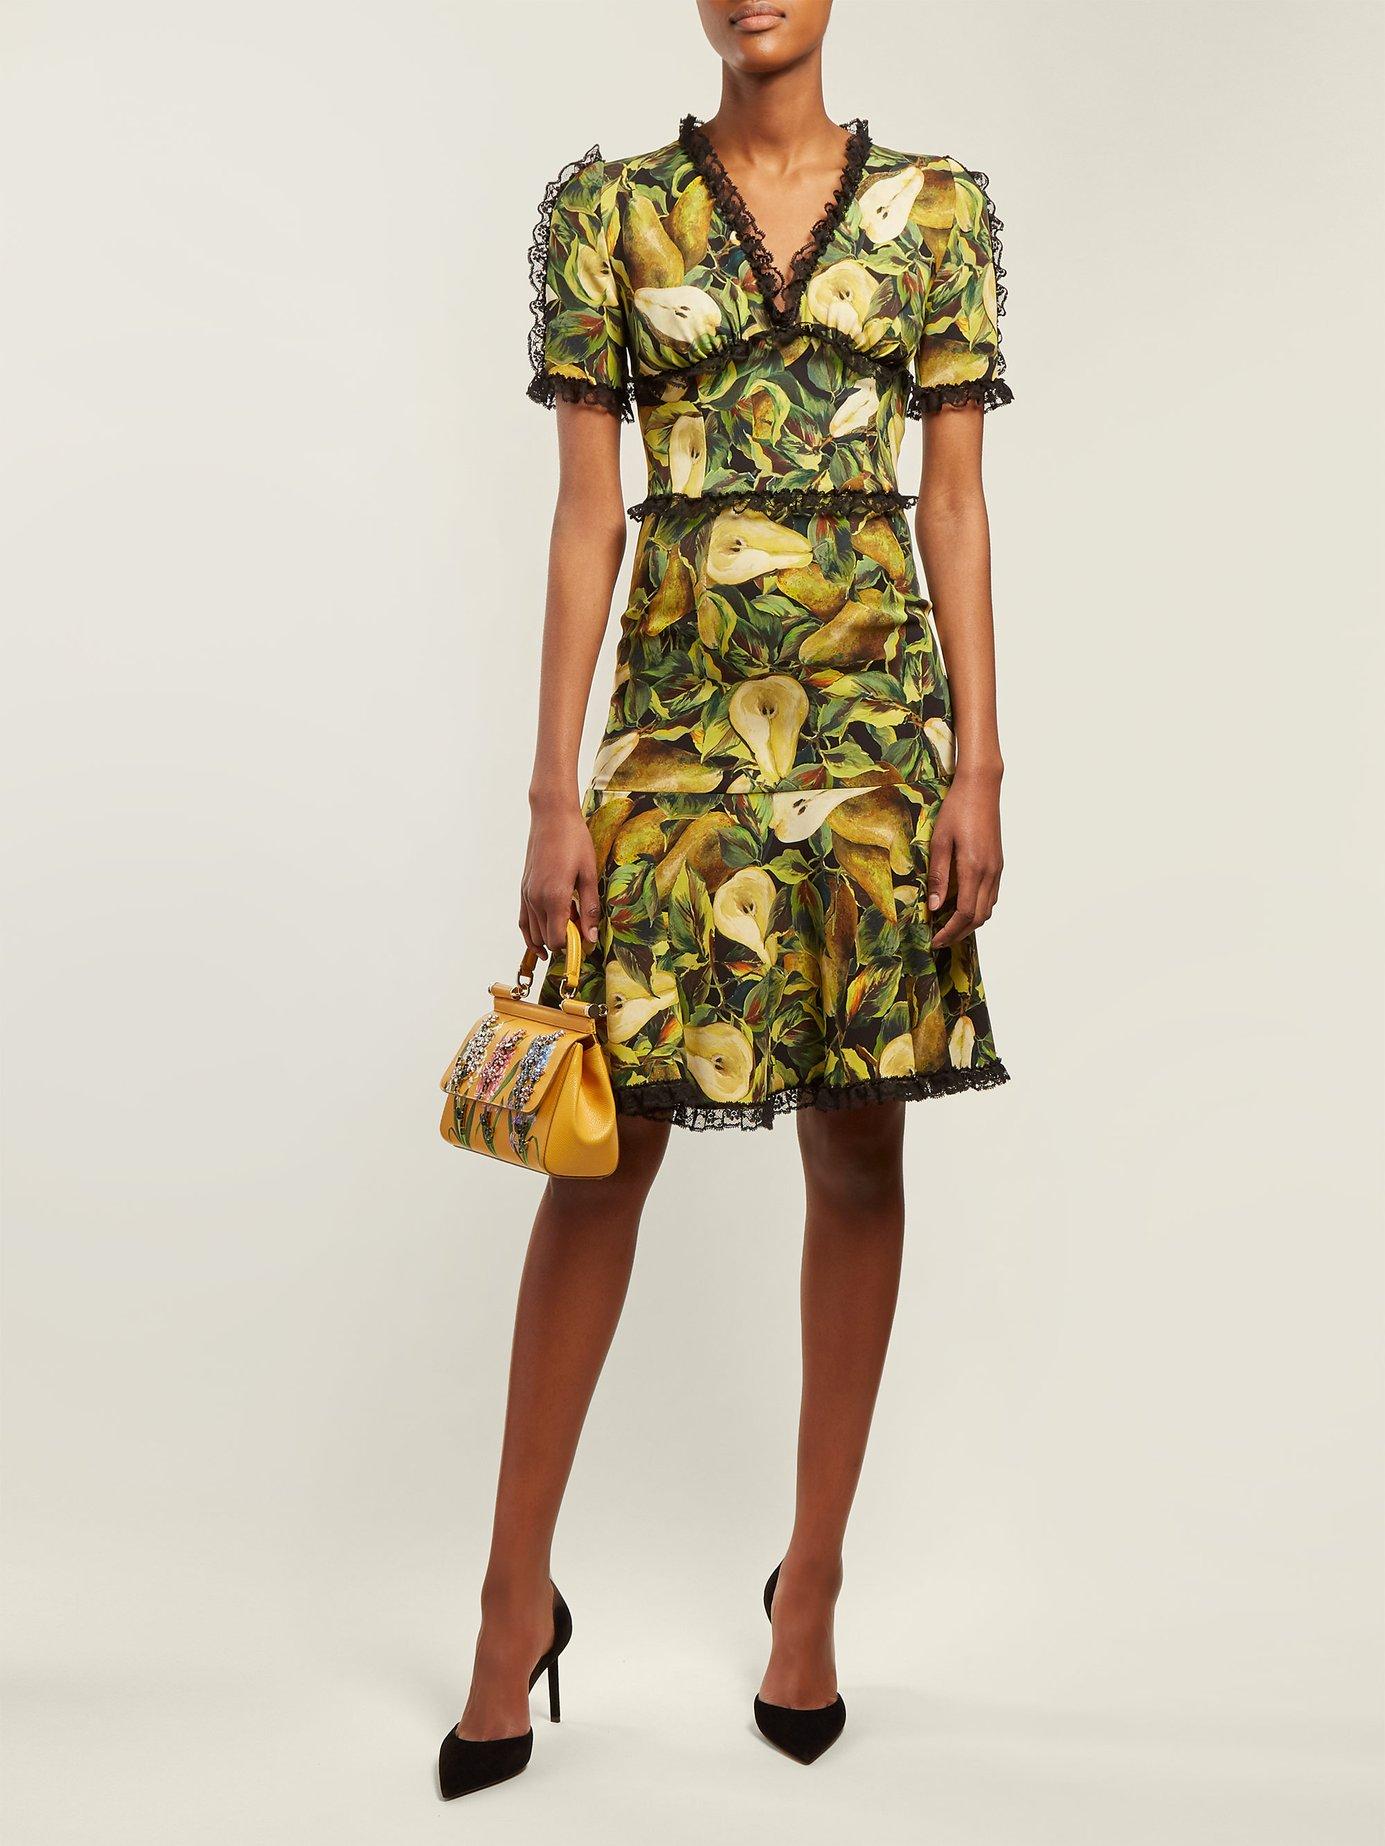 Pear-print midi dress by Dolce & Gabbana